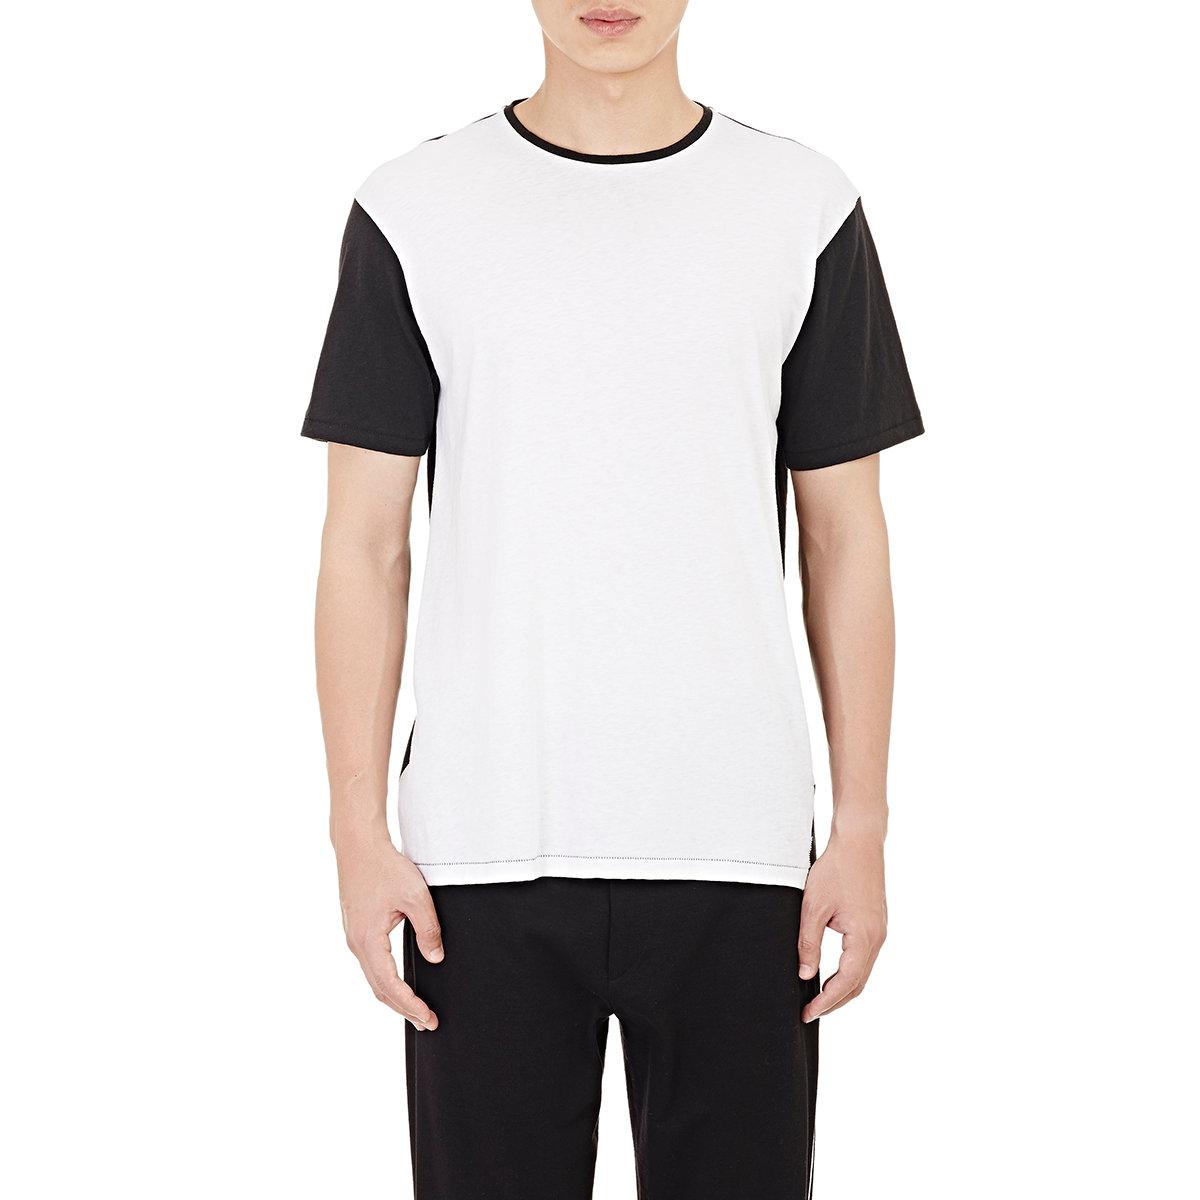 Lyst rag bone colorblocked everett t shirt in black for Rag and bone t shirts